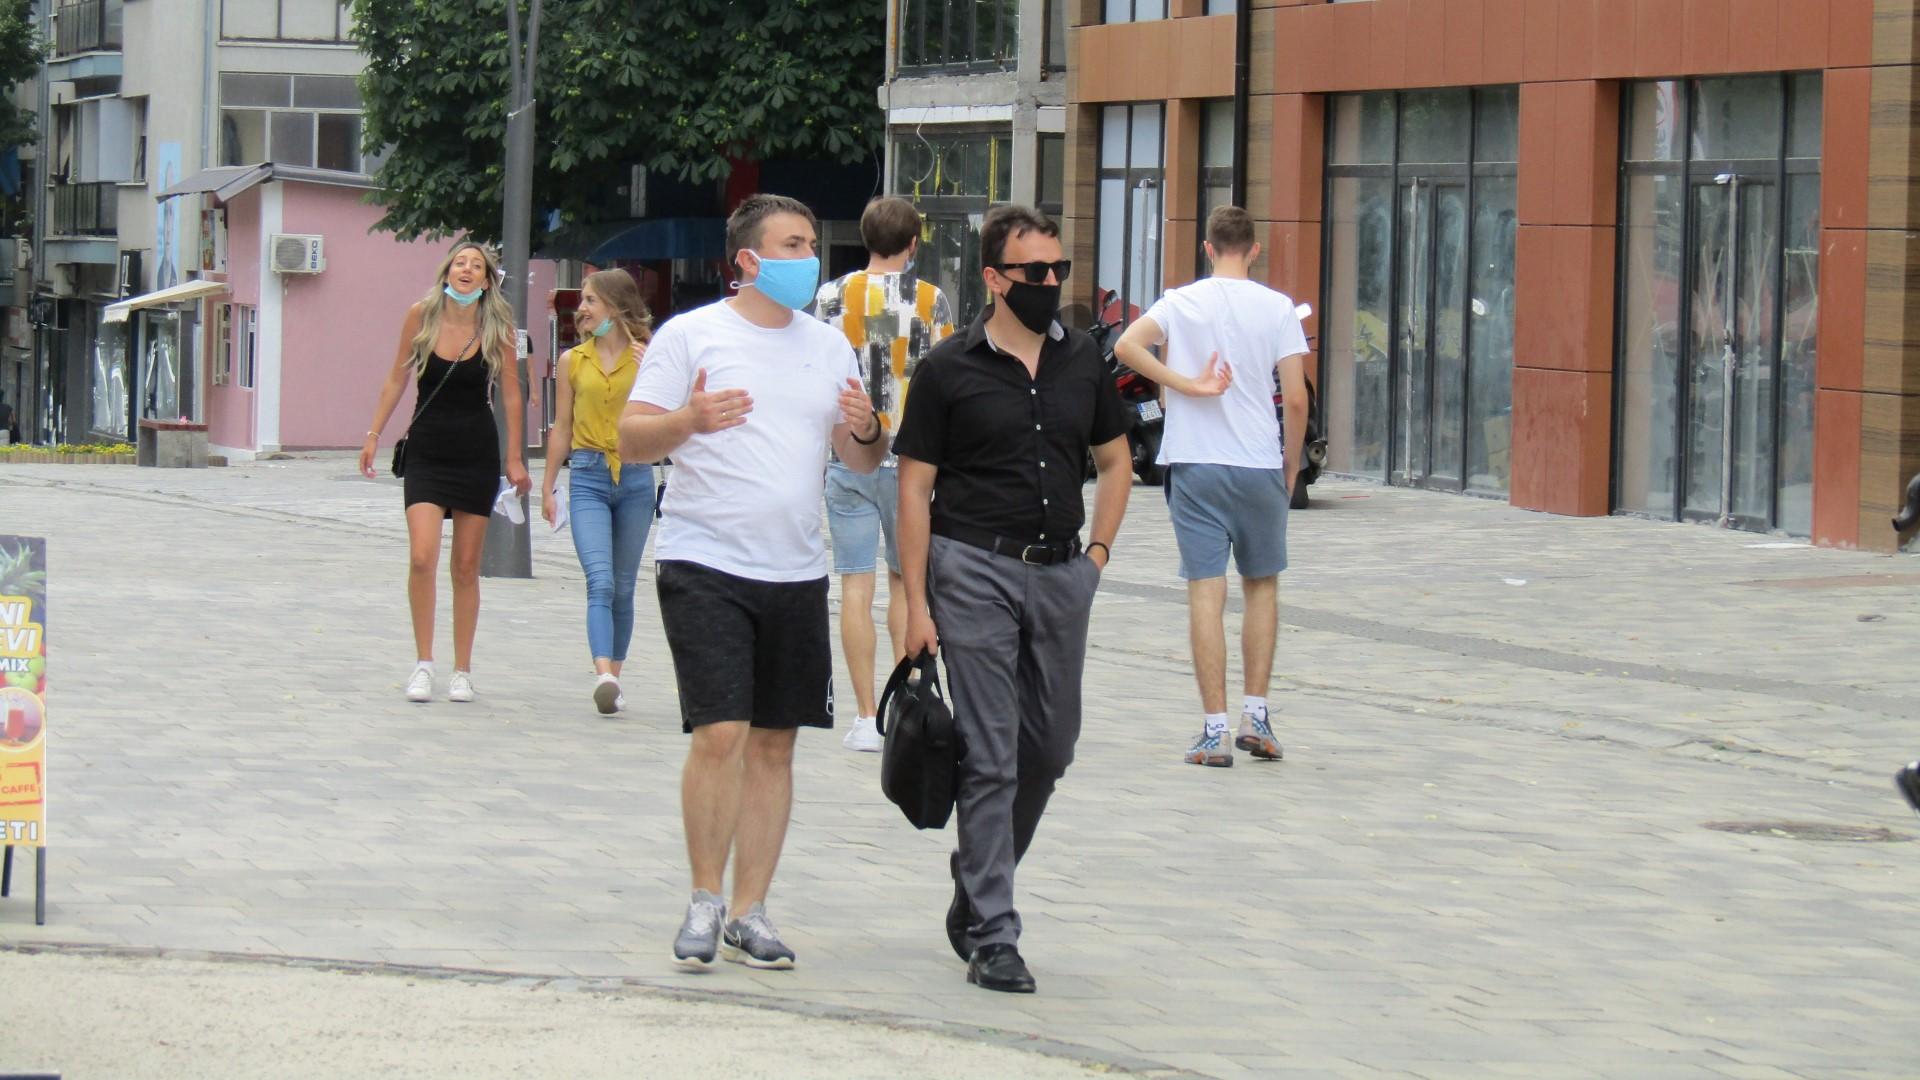 kosovo-cetvoro-preminulo-284-nova-slucaja-infekcije